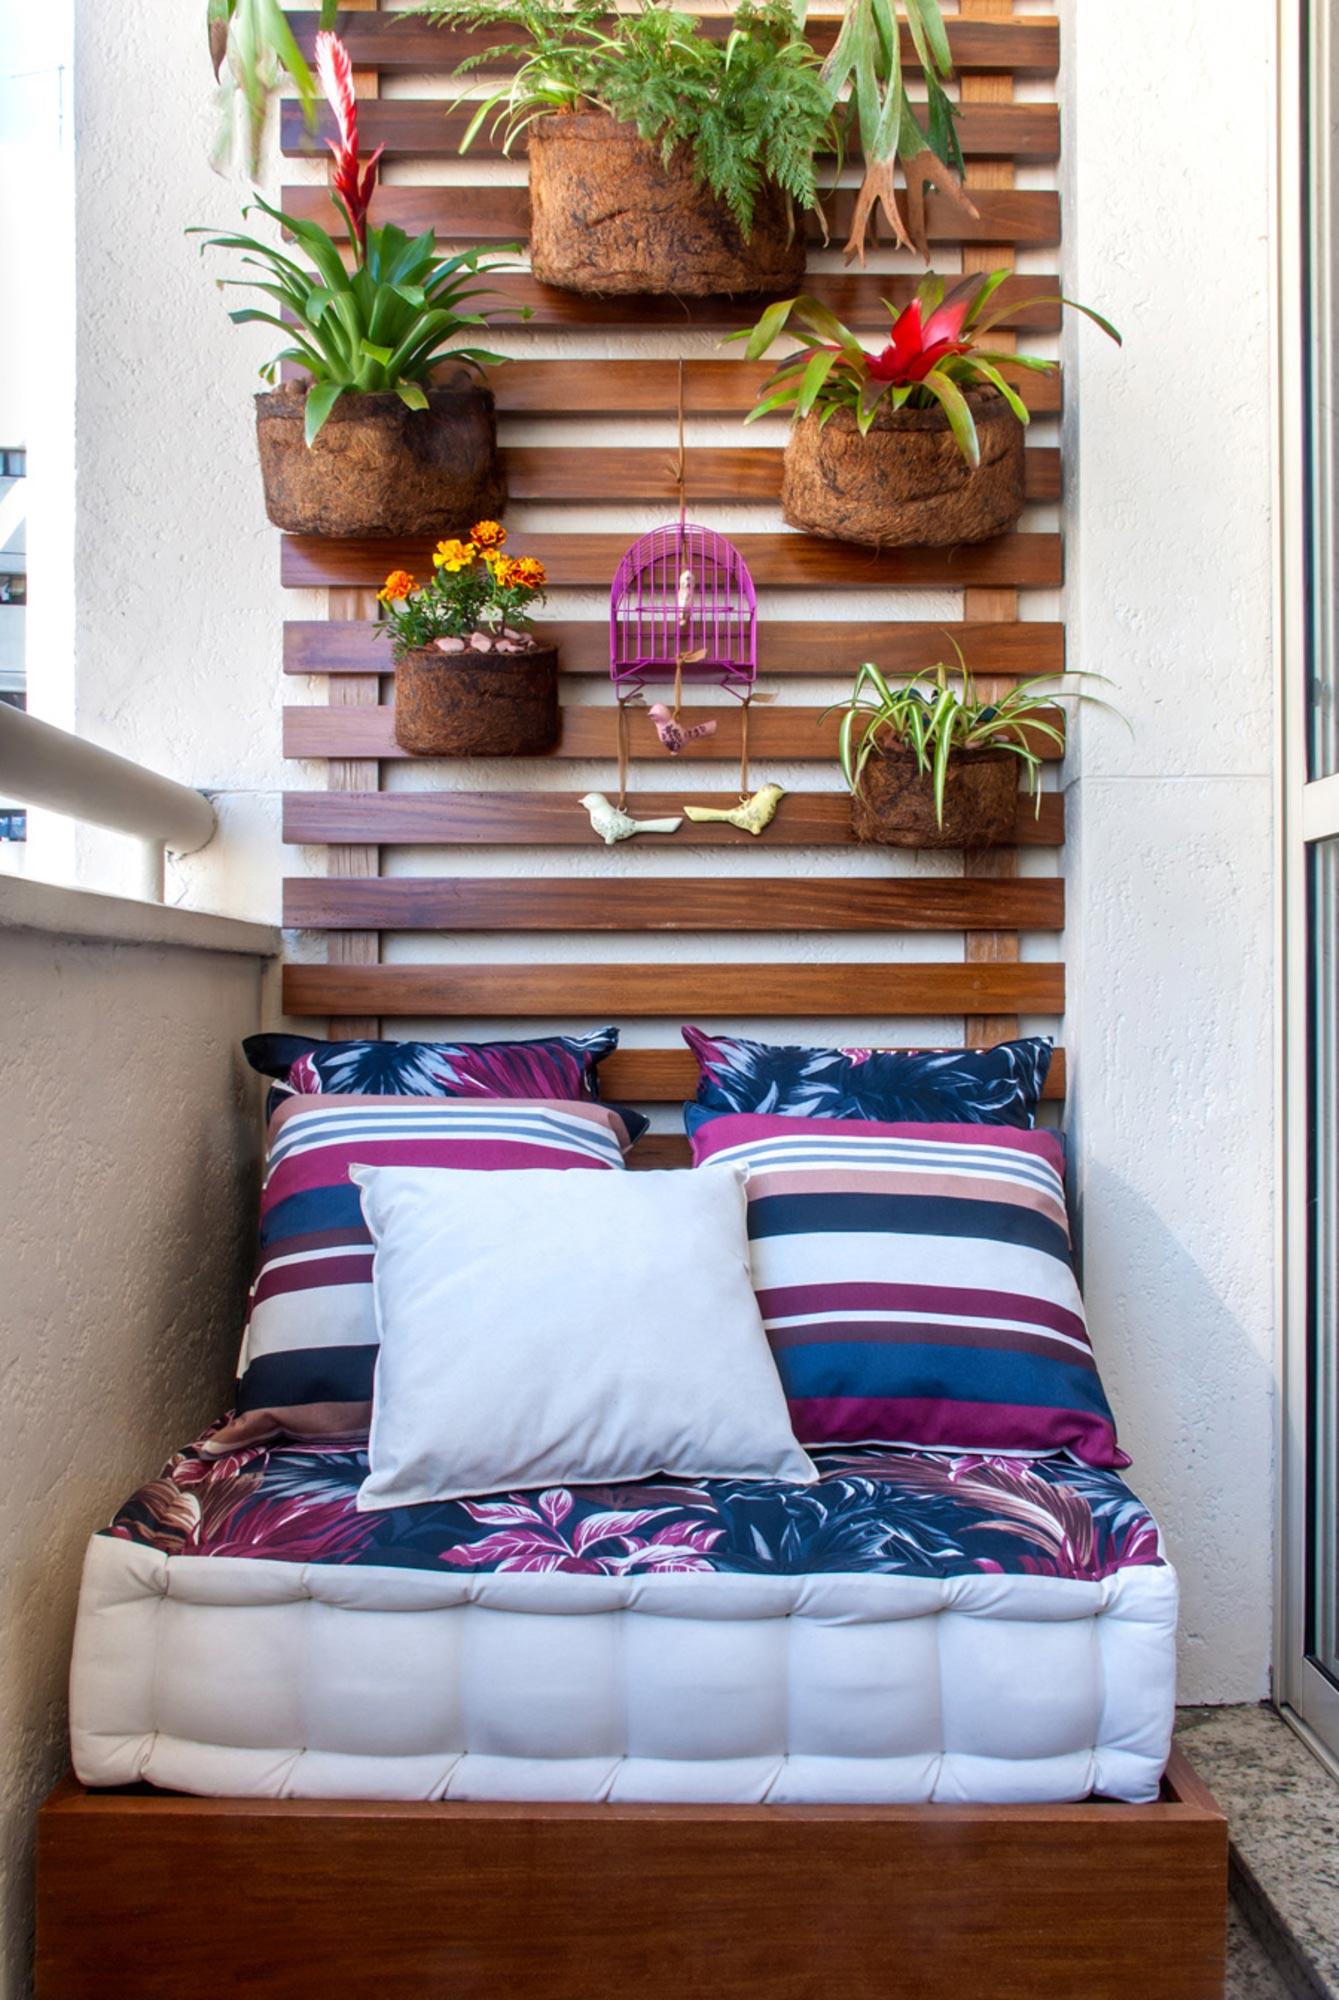 Идеи для декора на балконе своими руками.